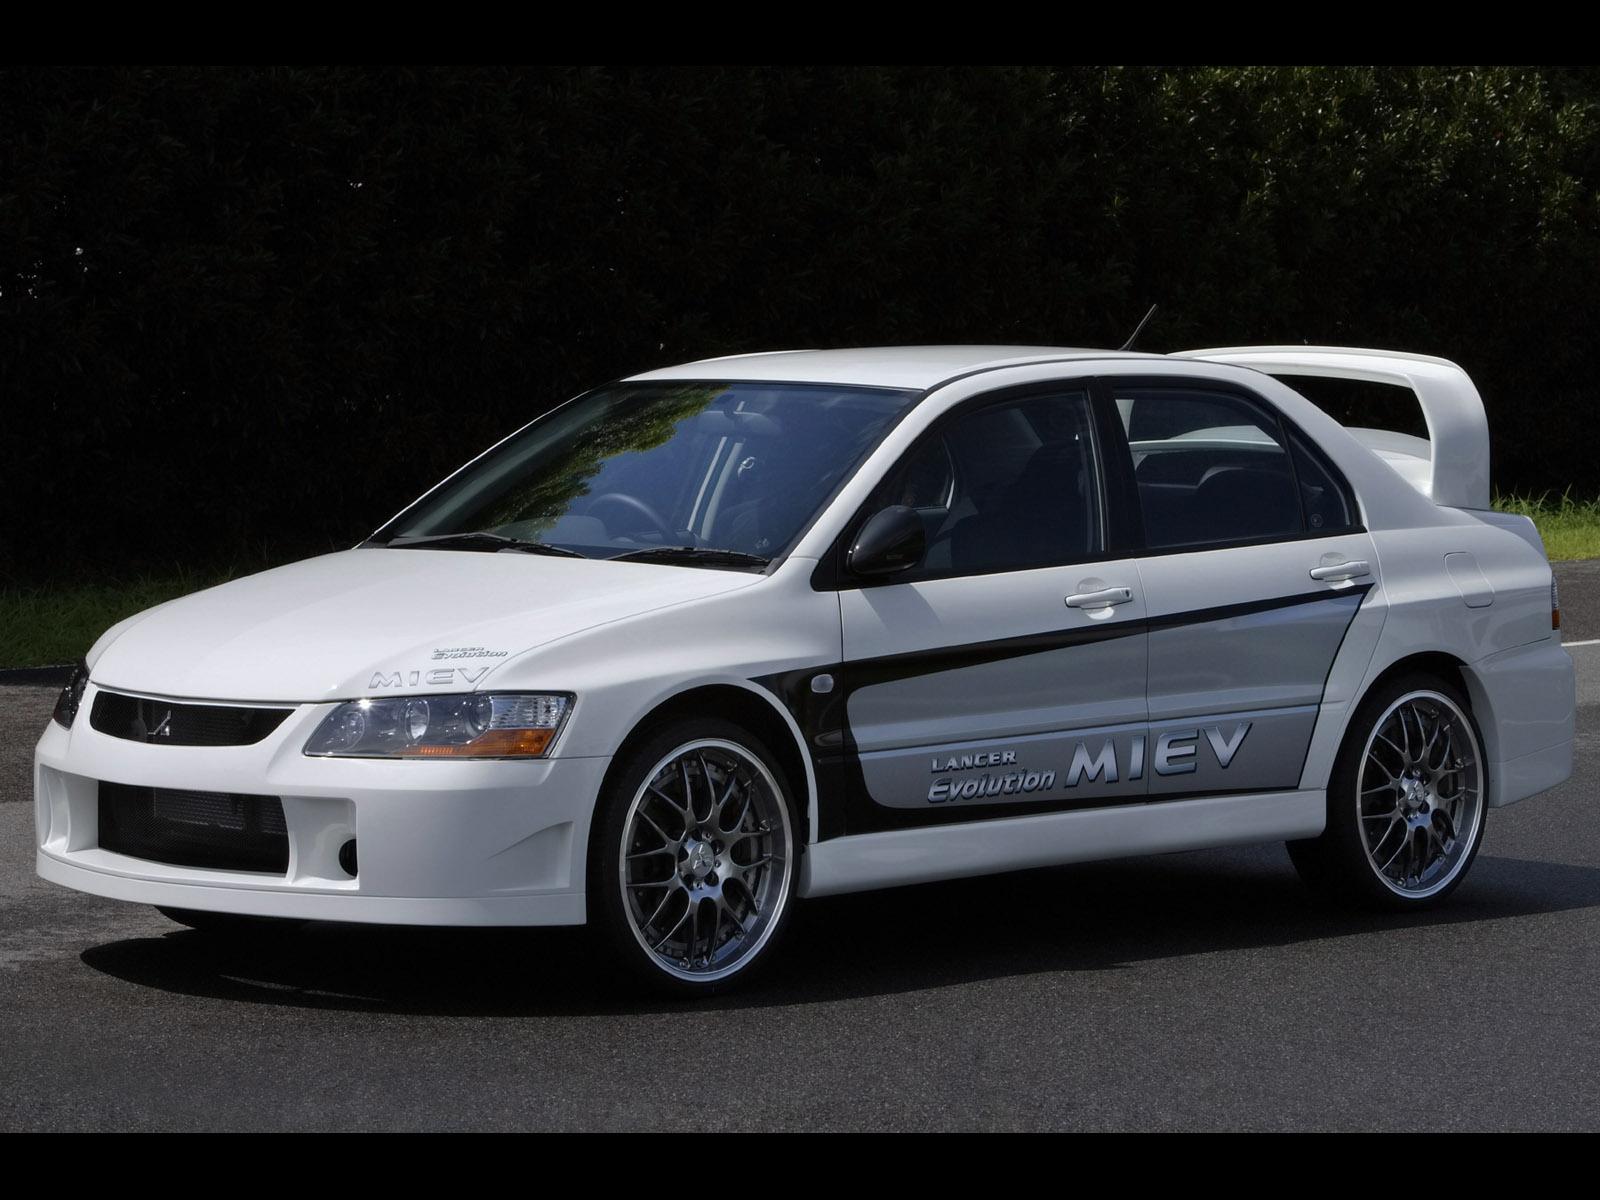 http://1.bp.blogspot.com/_cLWqMZQ1CPk/TTUb6PZwbpI/AAAAAAAAGMk/EYfXj7vtXE8/s1600/2005-Mitsubishi-Lancer-Evolution-MIEV-SA-1600x1200.jpg